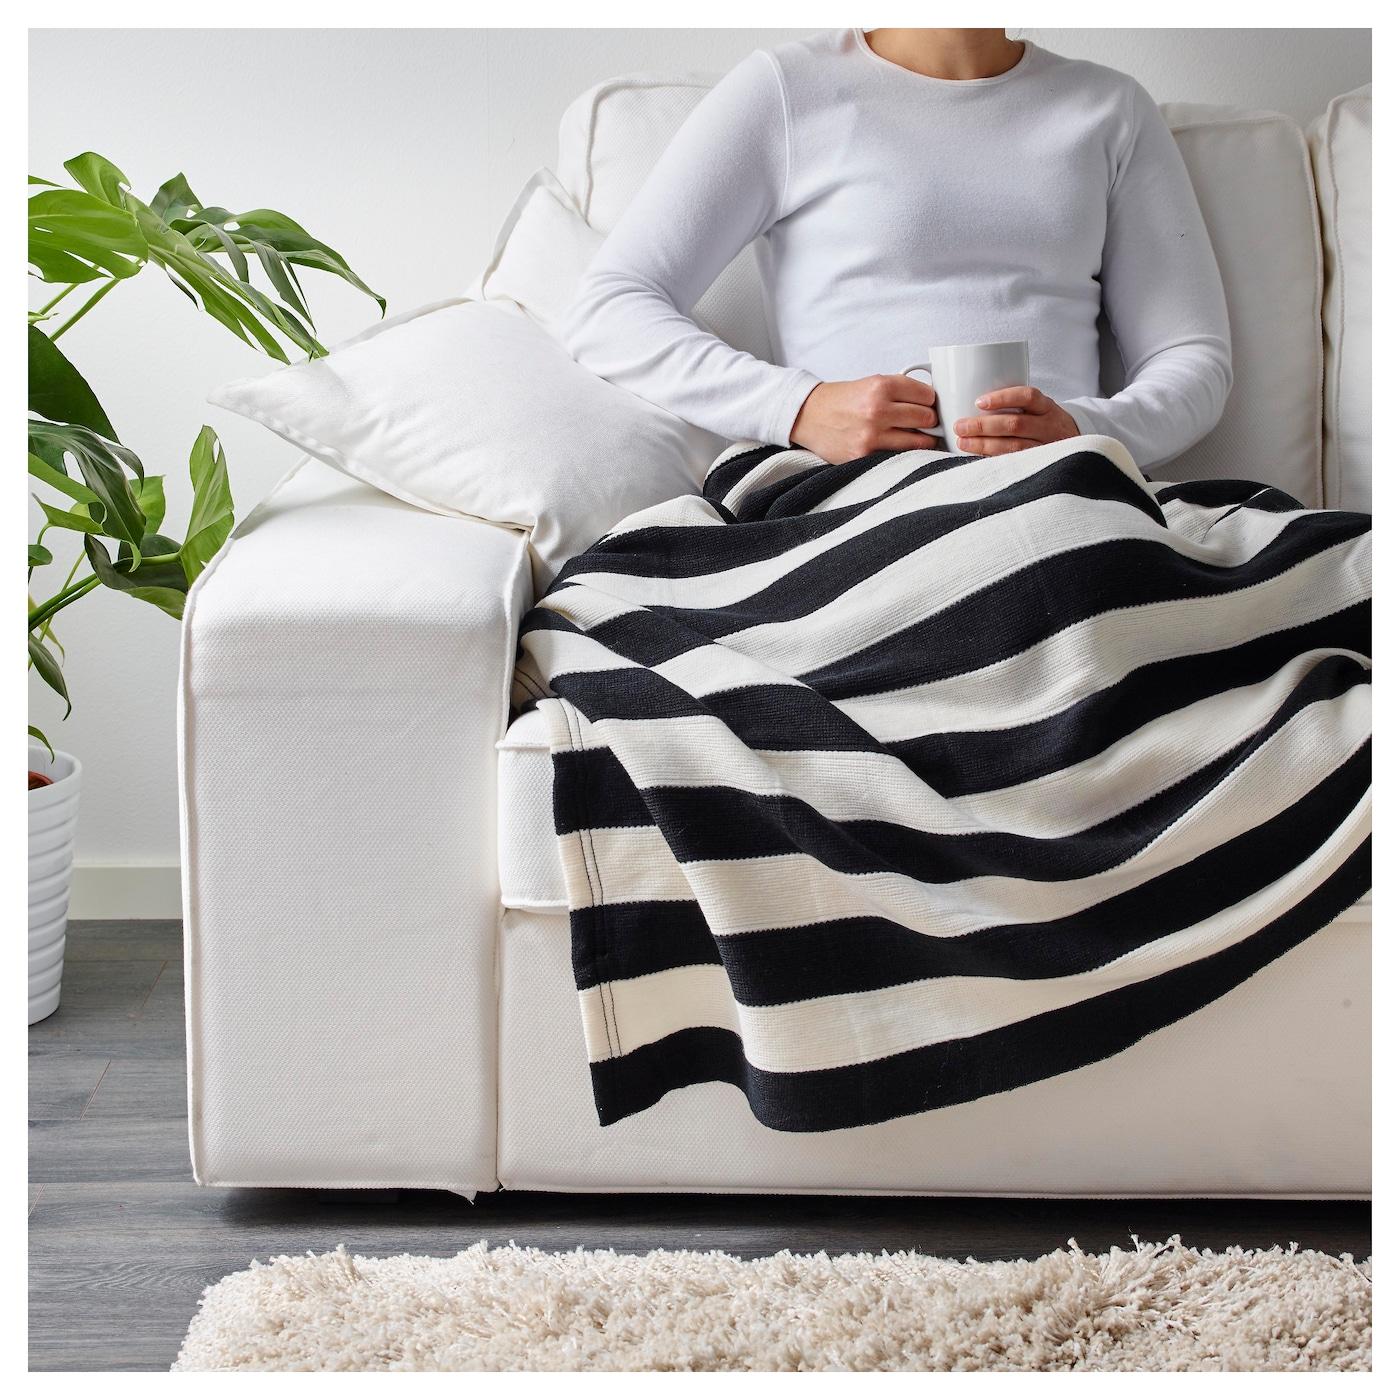 eivor throw black white 125x170 cm ikea. Black Bedroom Furniture Sets. Home Design Ideas